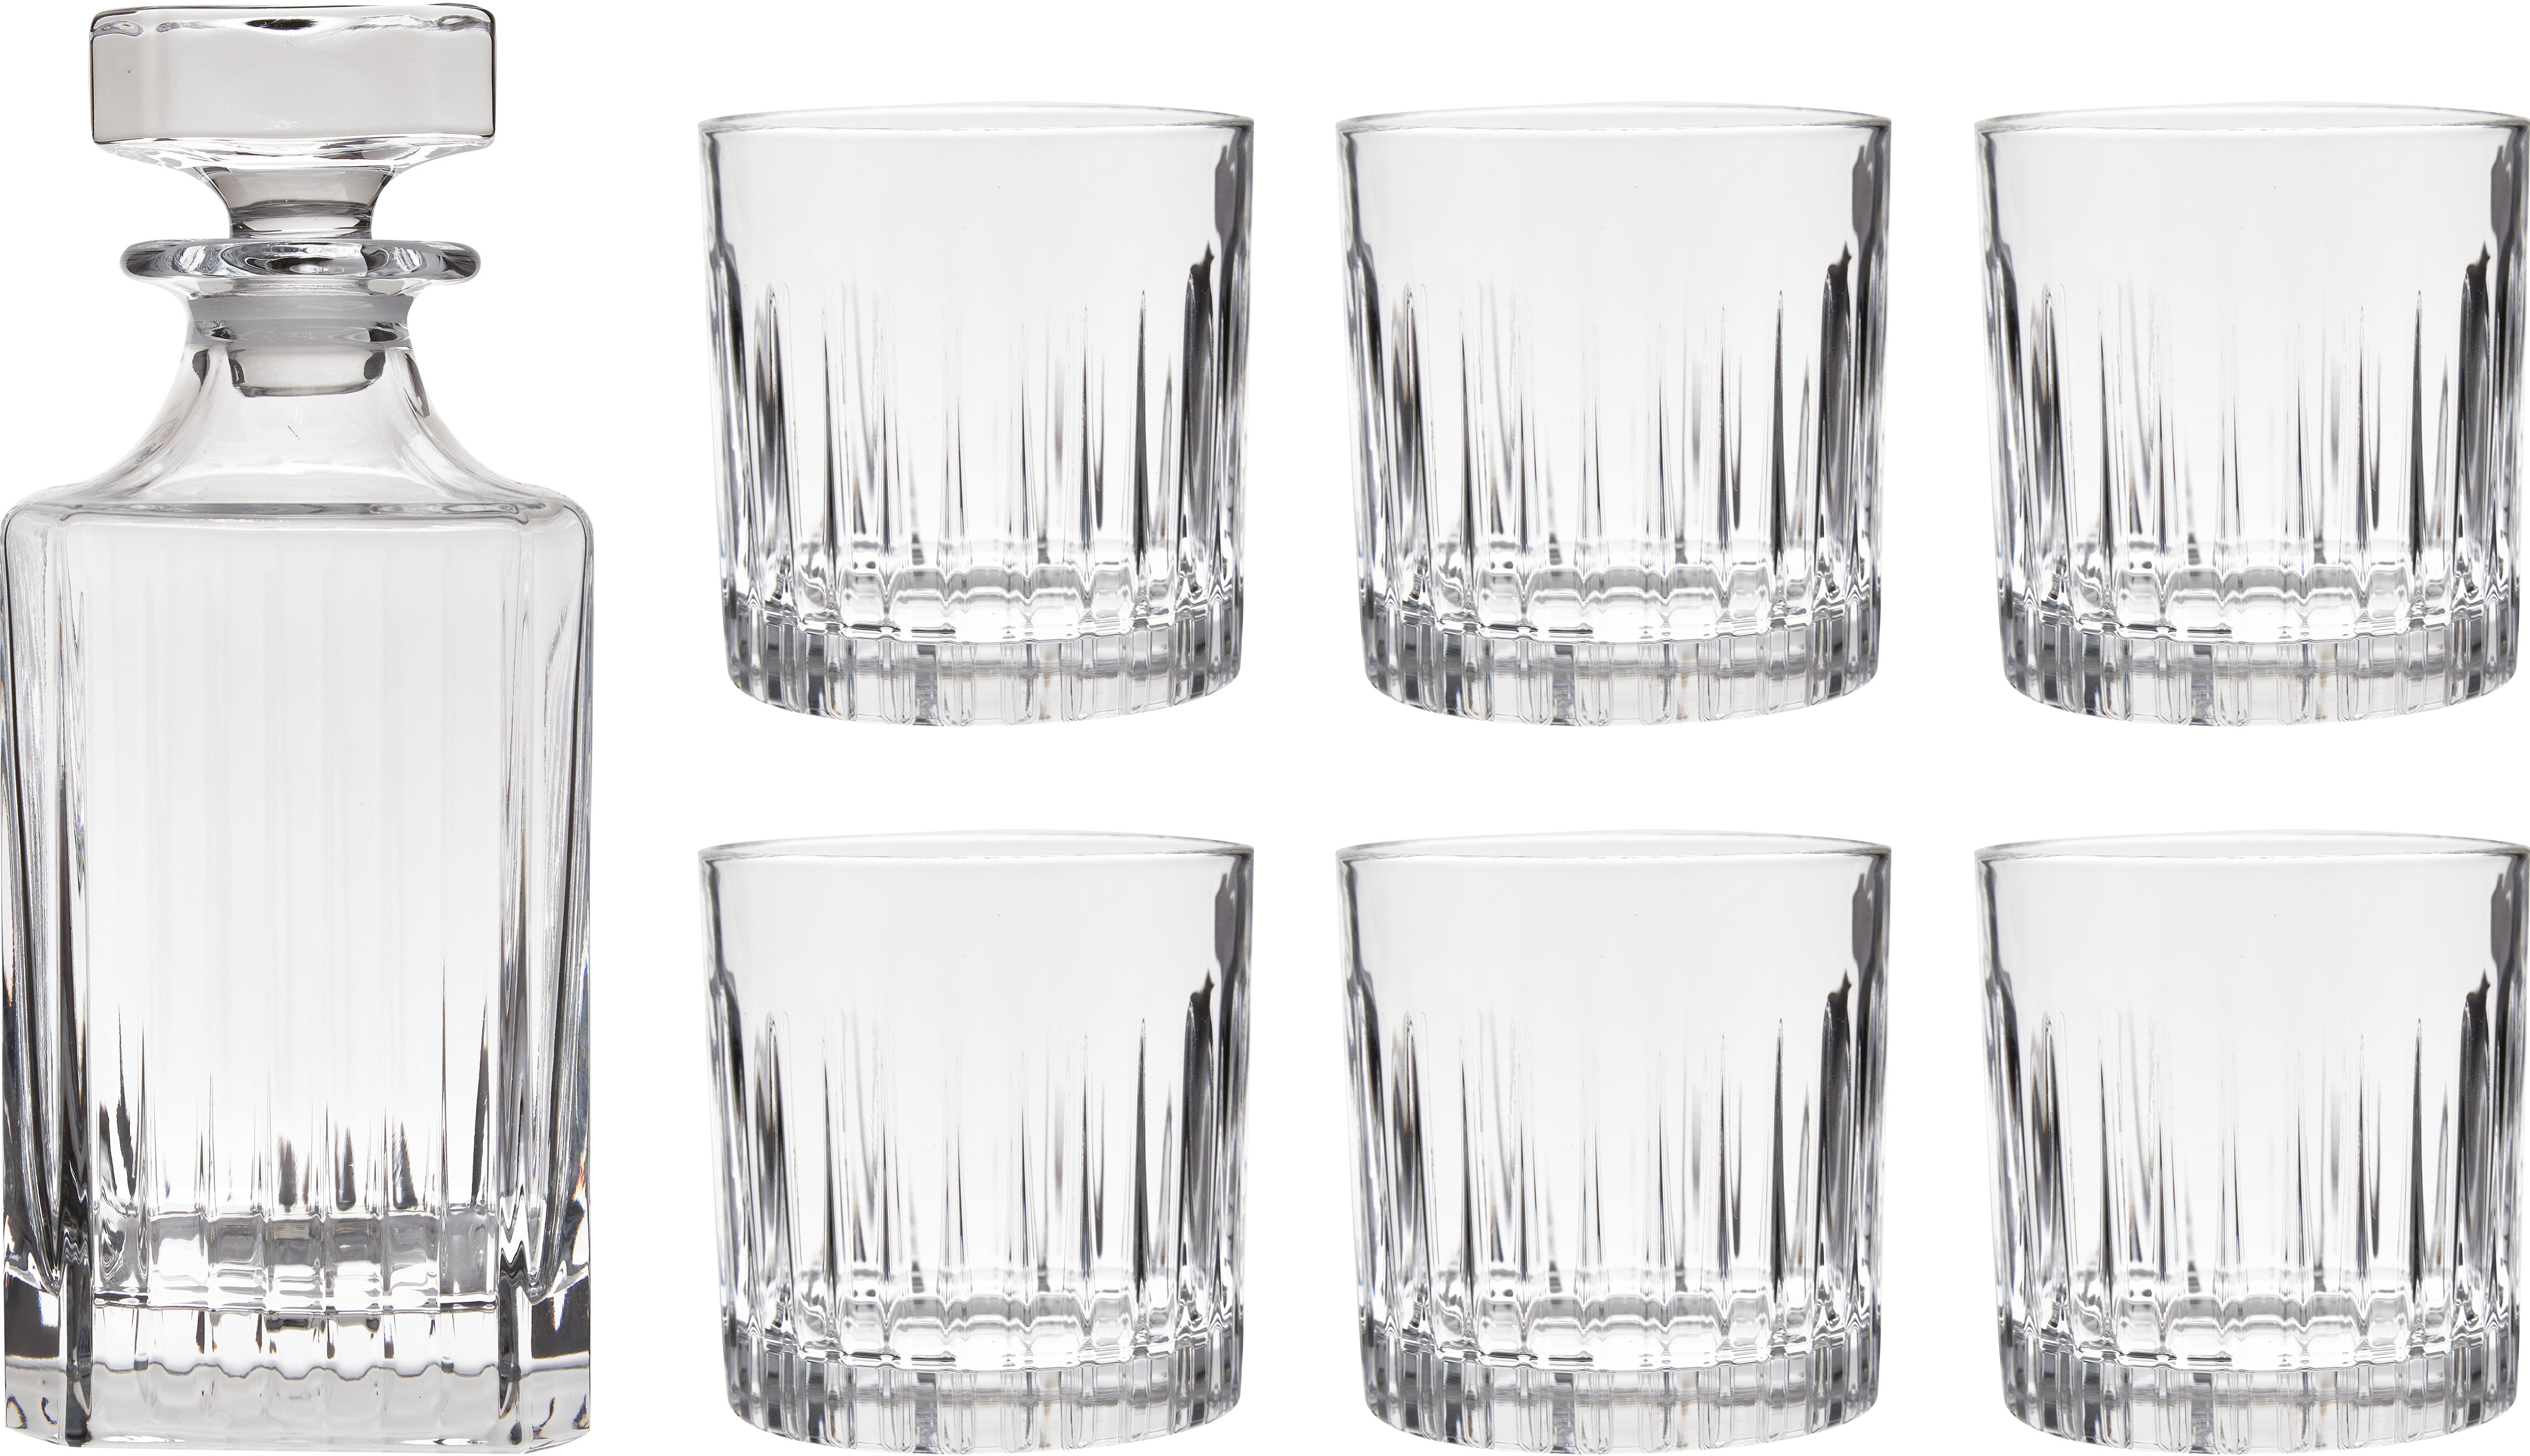 Set de whisky de cristal Timeless, 7pzas., Cristal, Transparente, Set de diferentes tamaños